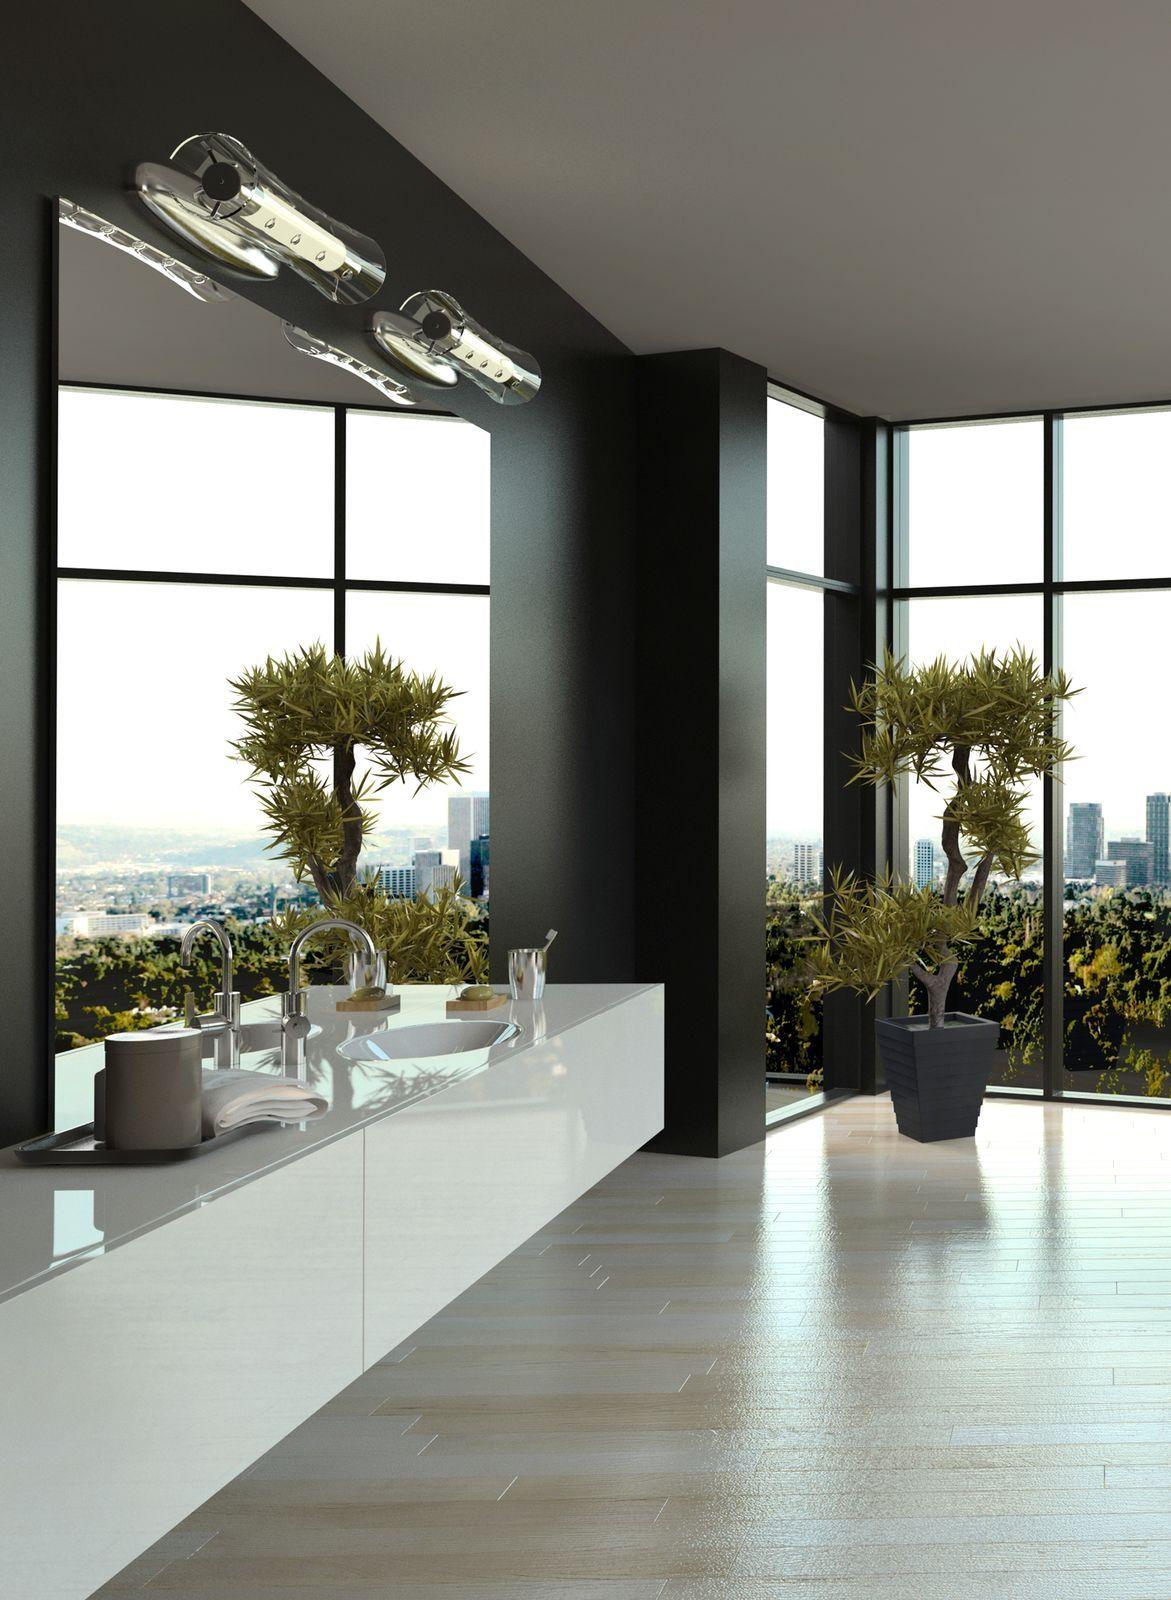 Panoramic Windows For A Very Zen Spot Homeyou